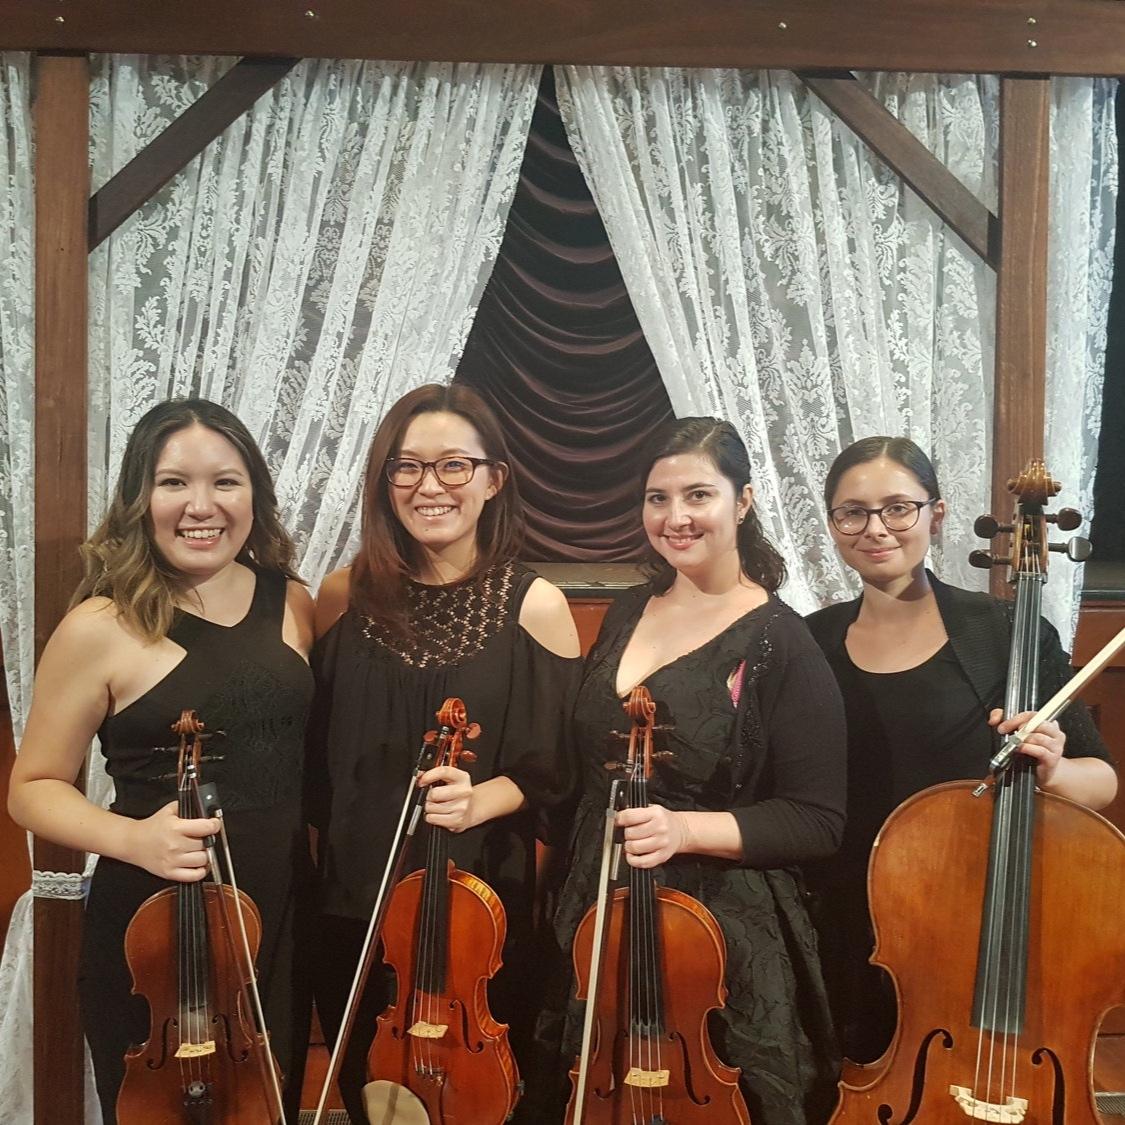 perth-function-string-music-hire-wedding-riverside-quartet-viola-violin-cello